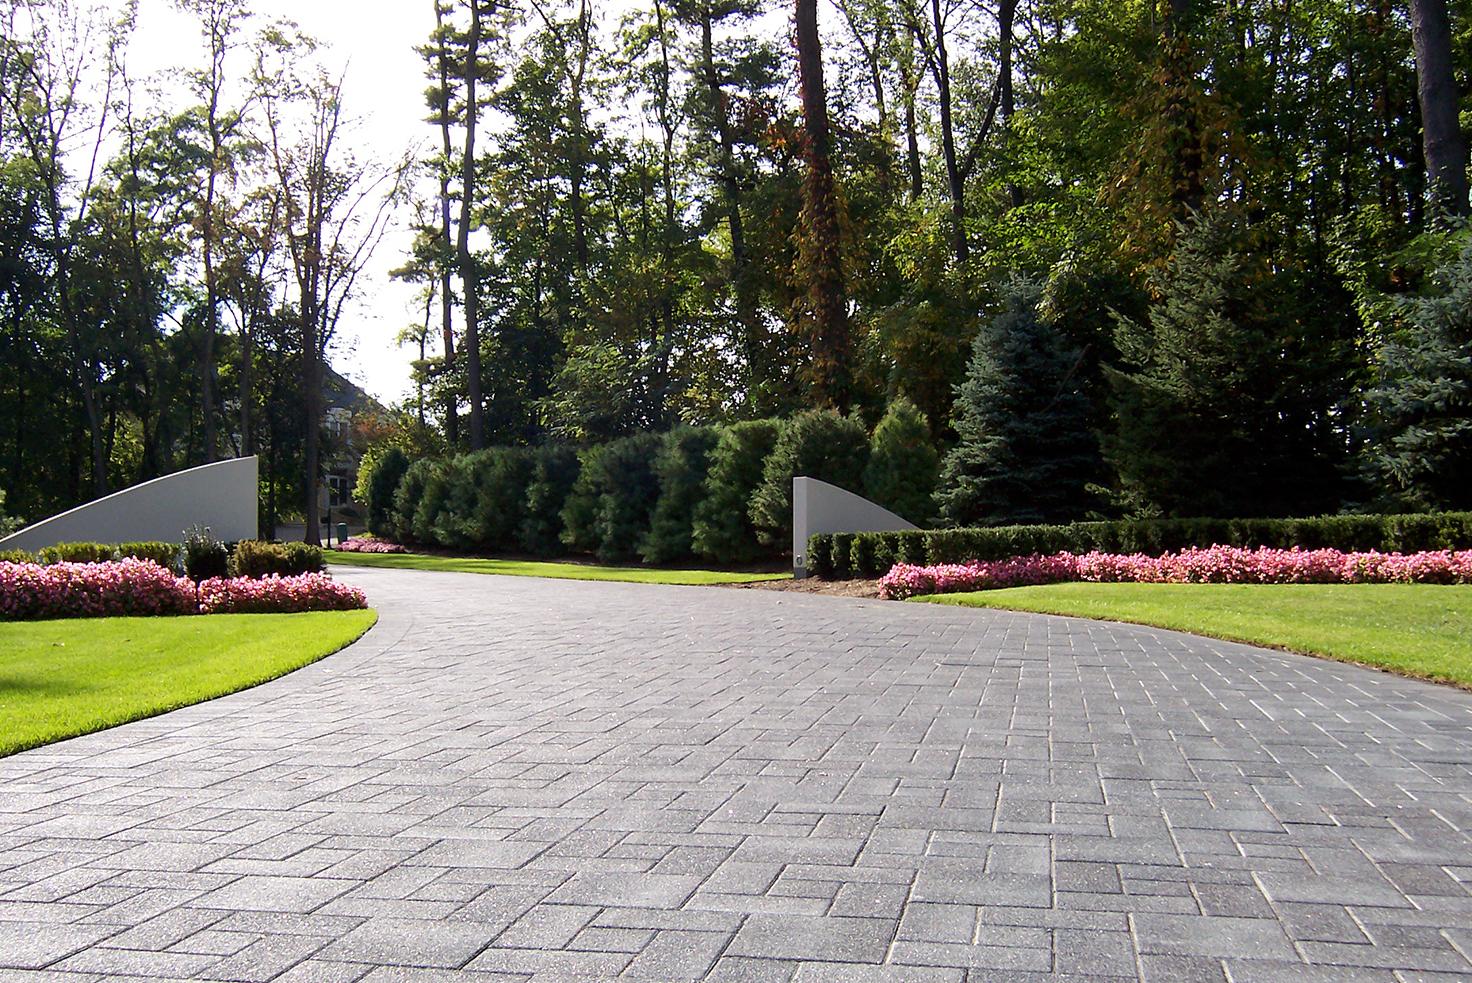 Macomb, MI top driveway pavers and paving stones